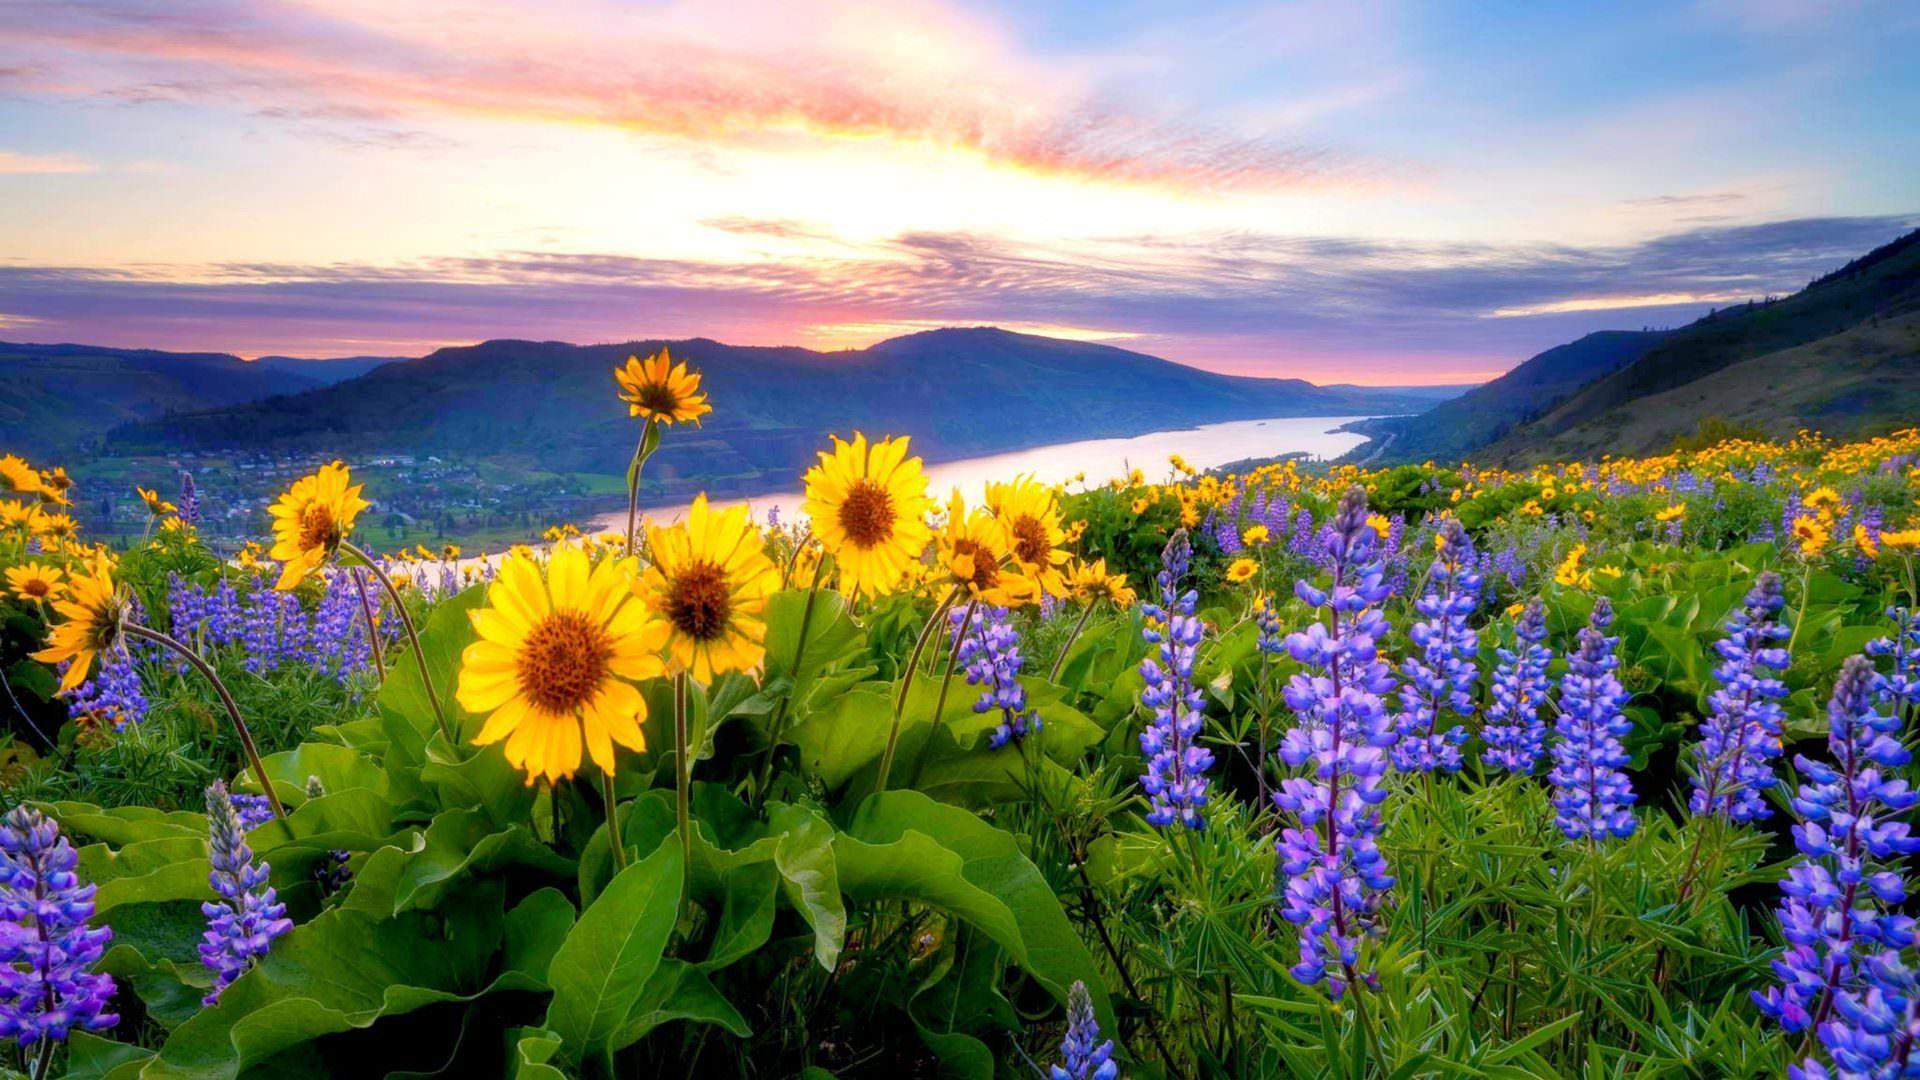 Spring Mountain Landscape Flowers Purple Colored Hills: Spring Flowers Mountain Lake Hills [1920×1080]